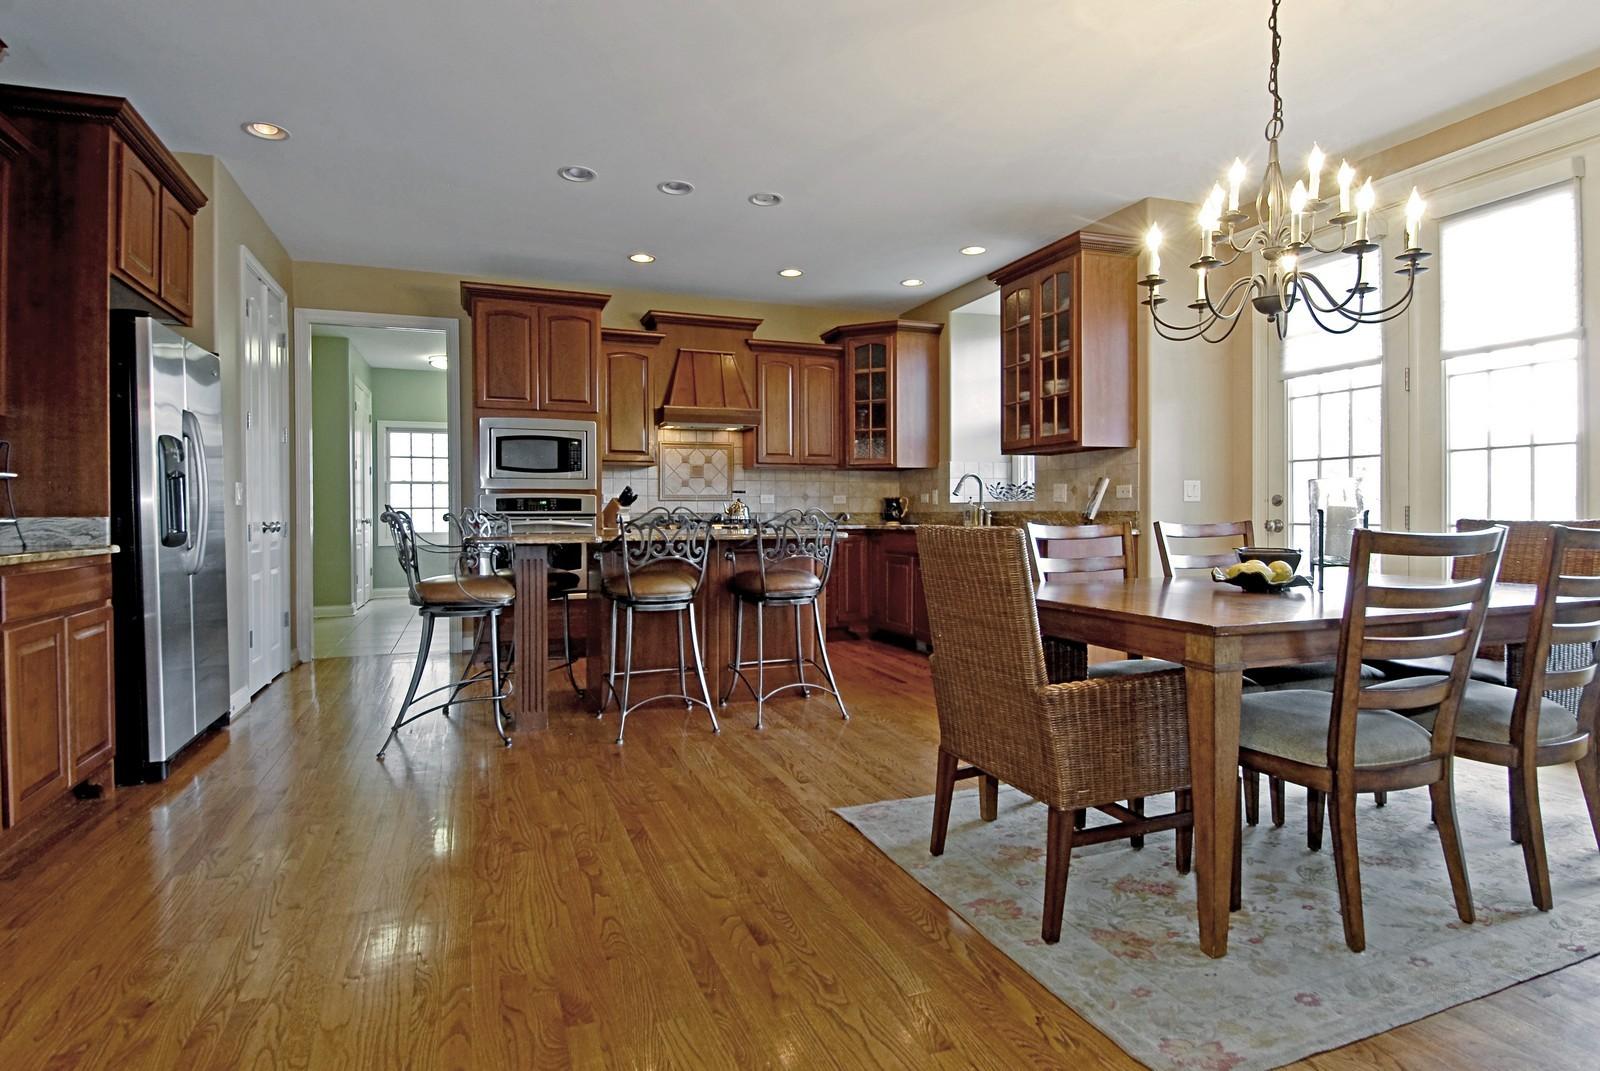 Real Estate Photography - 3839 Junebreeze Ln, Naperville, IL, 60564 - Kitchen / Breakfast Room